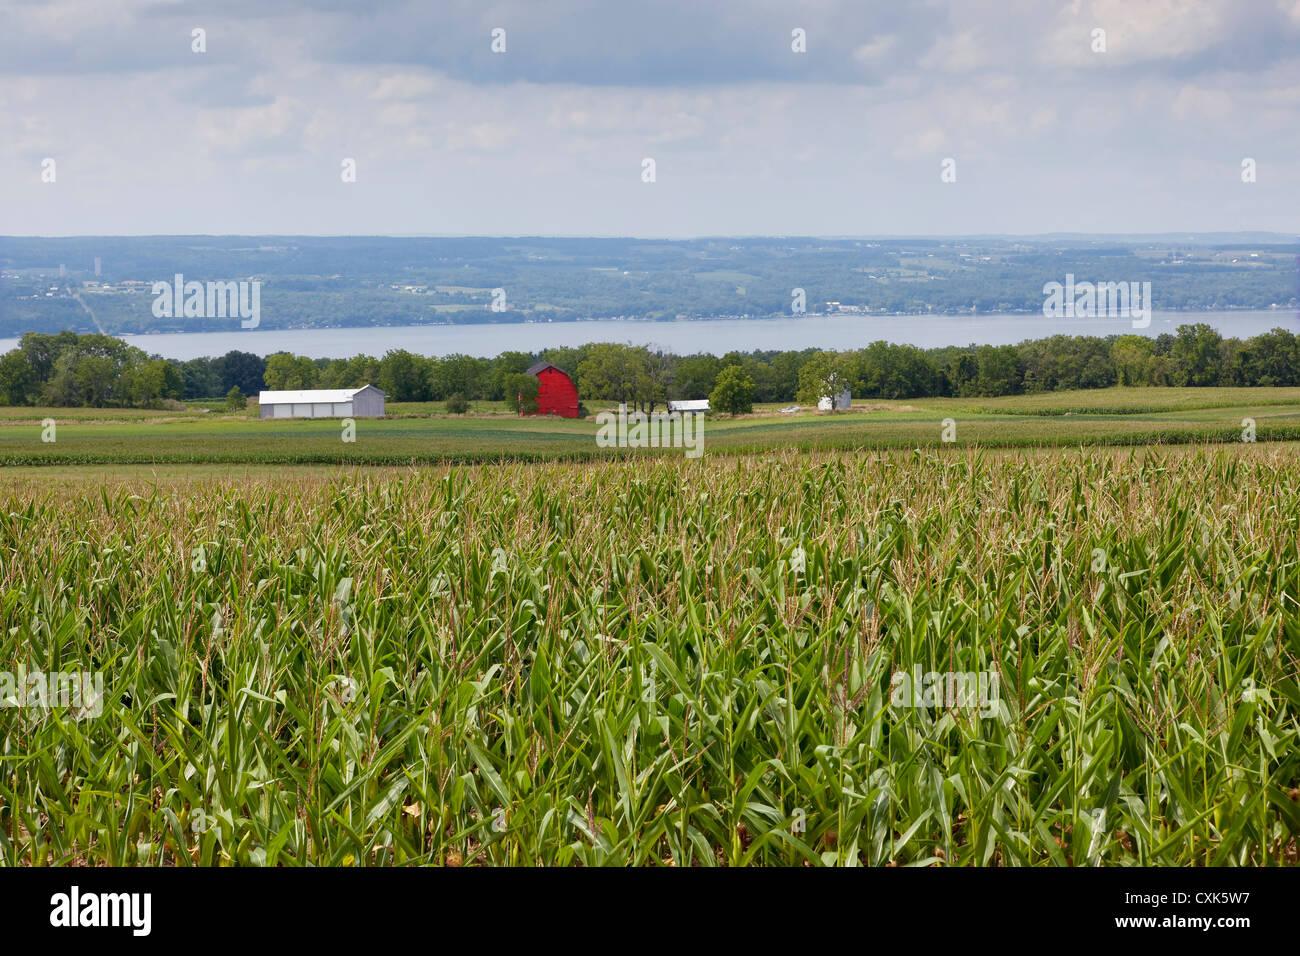 Ripe Corn Field, Finger Lakes Region, New York State - Stock Image